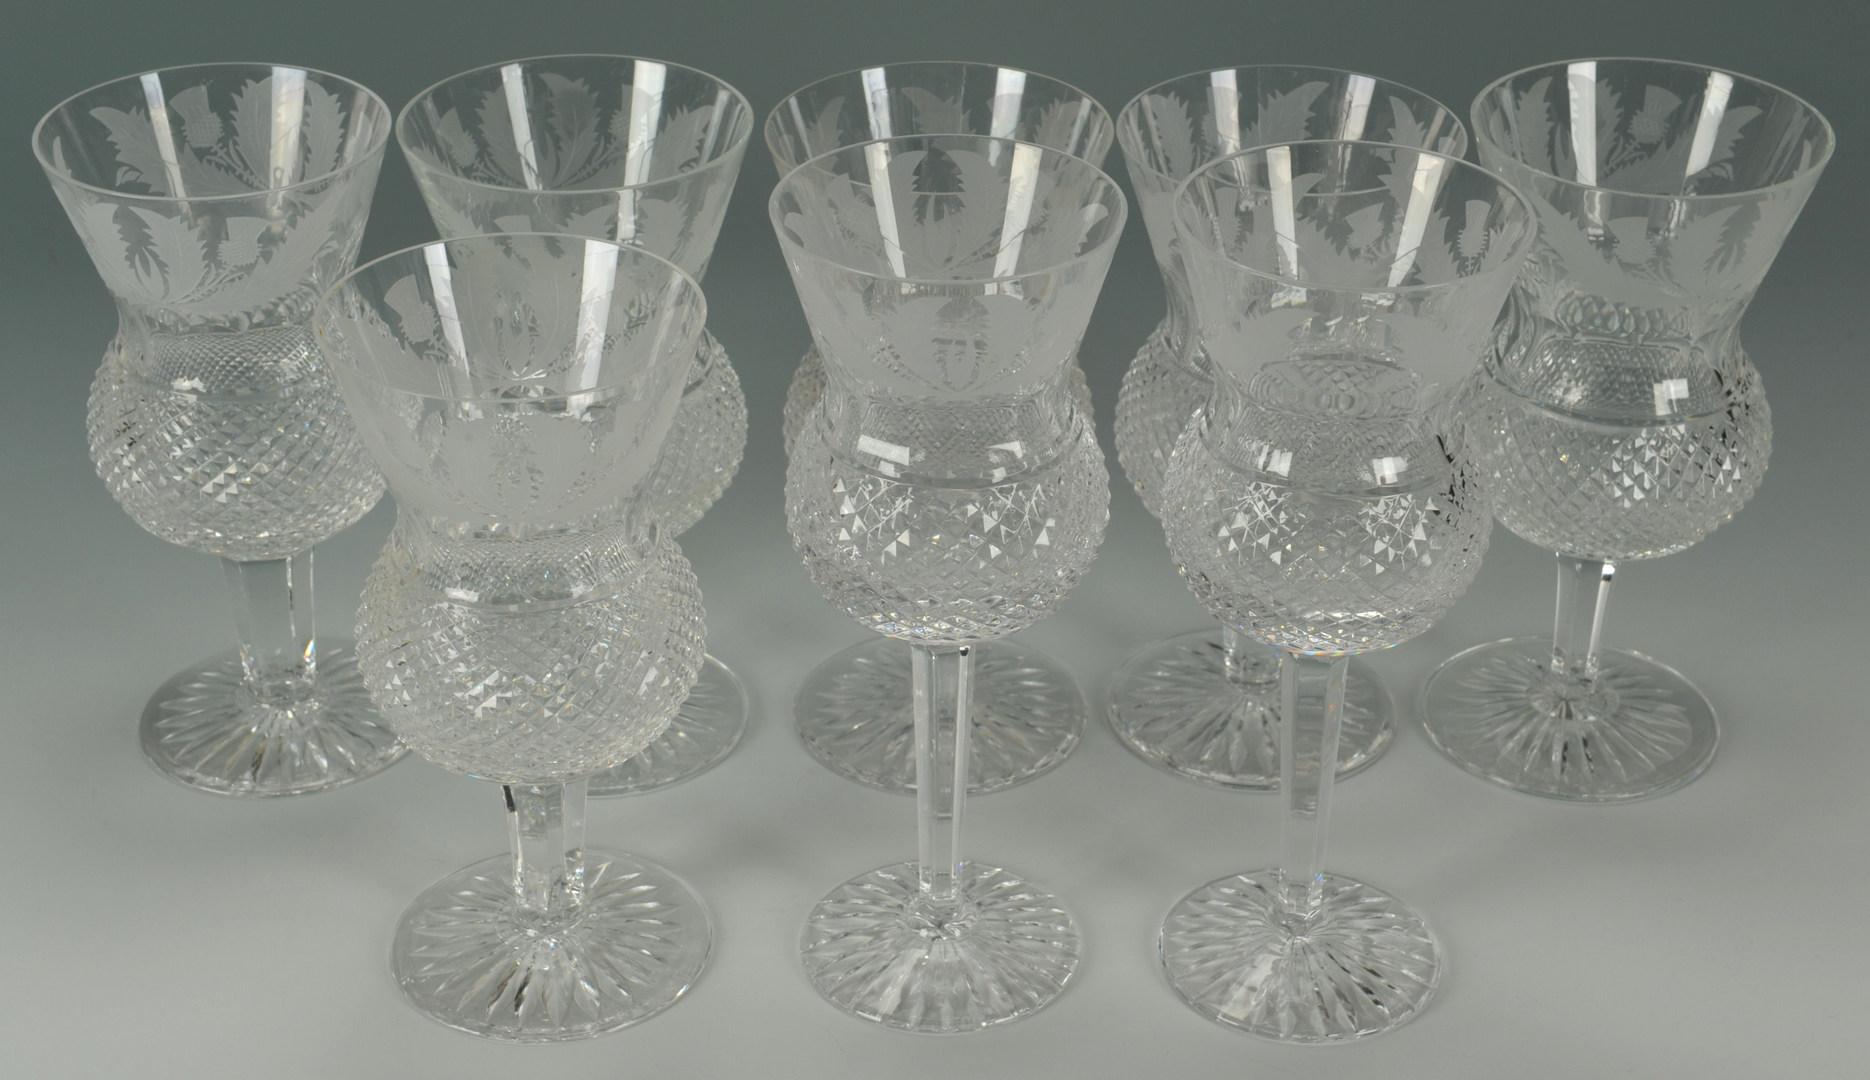 Lot 119: Edinburgh Crystal Stemware Thistle Pattern, 8 pcs